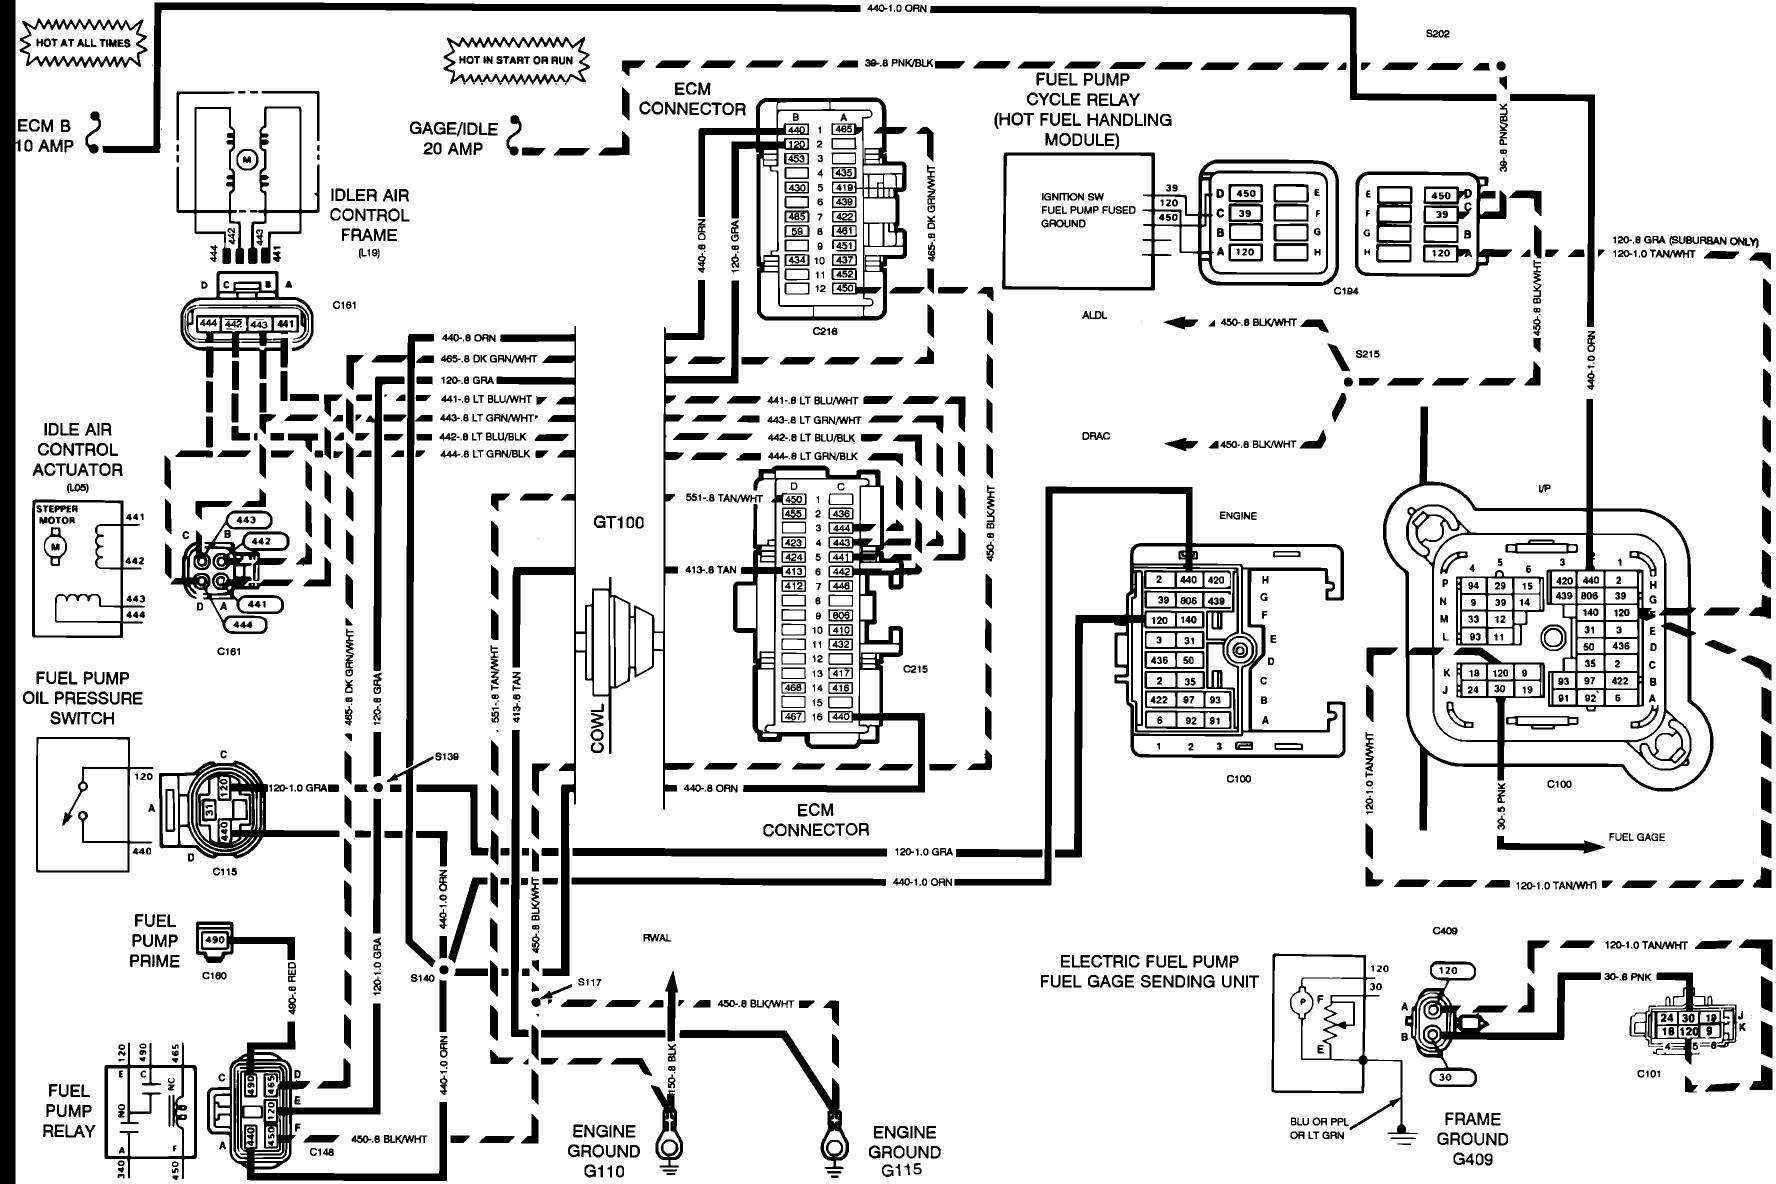 1992 Fleetwood Pace Arrow Wiring Diagram